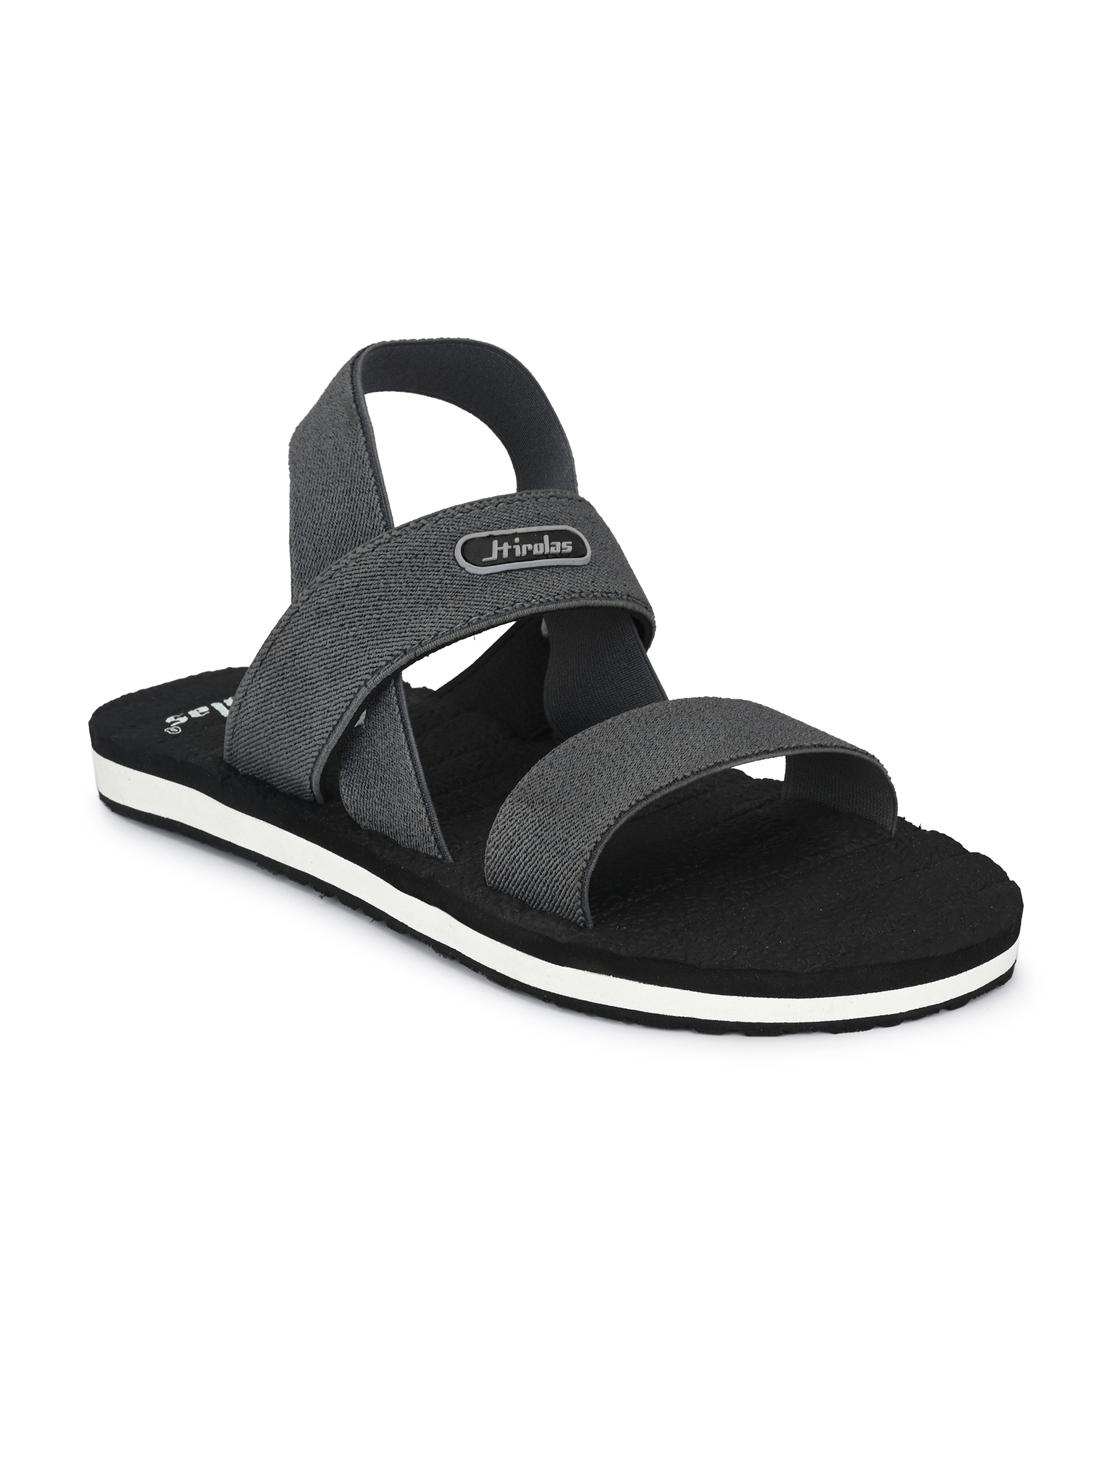 Hirolas | Hirolas Trendy Fabrication Flip-Flops Elasticated comfortable Slippers - Grey